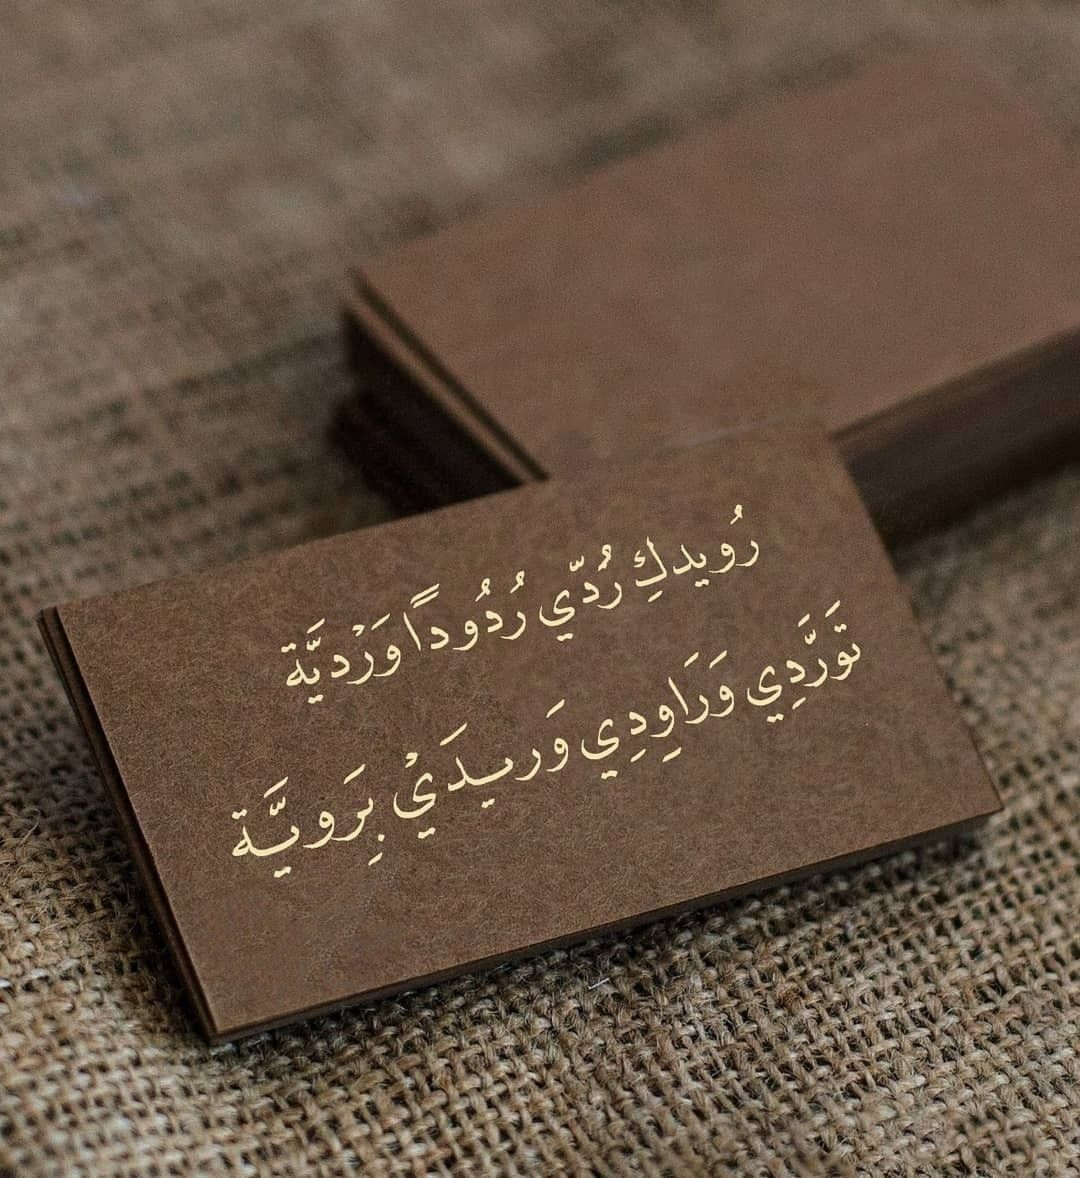 يا عذوبة الفصحى Words Quotes Wise Words Quotes Arabic Quotes